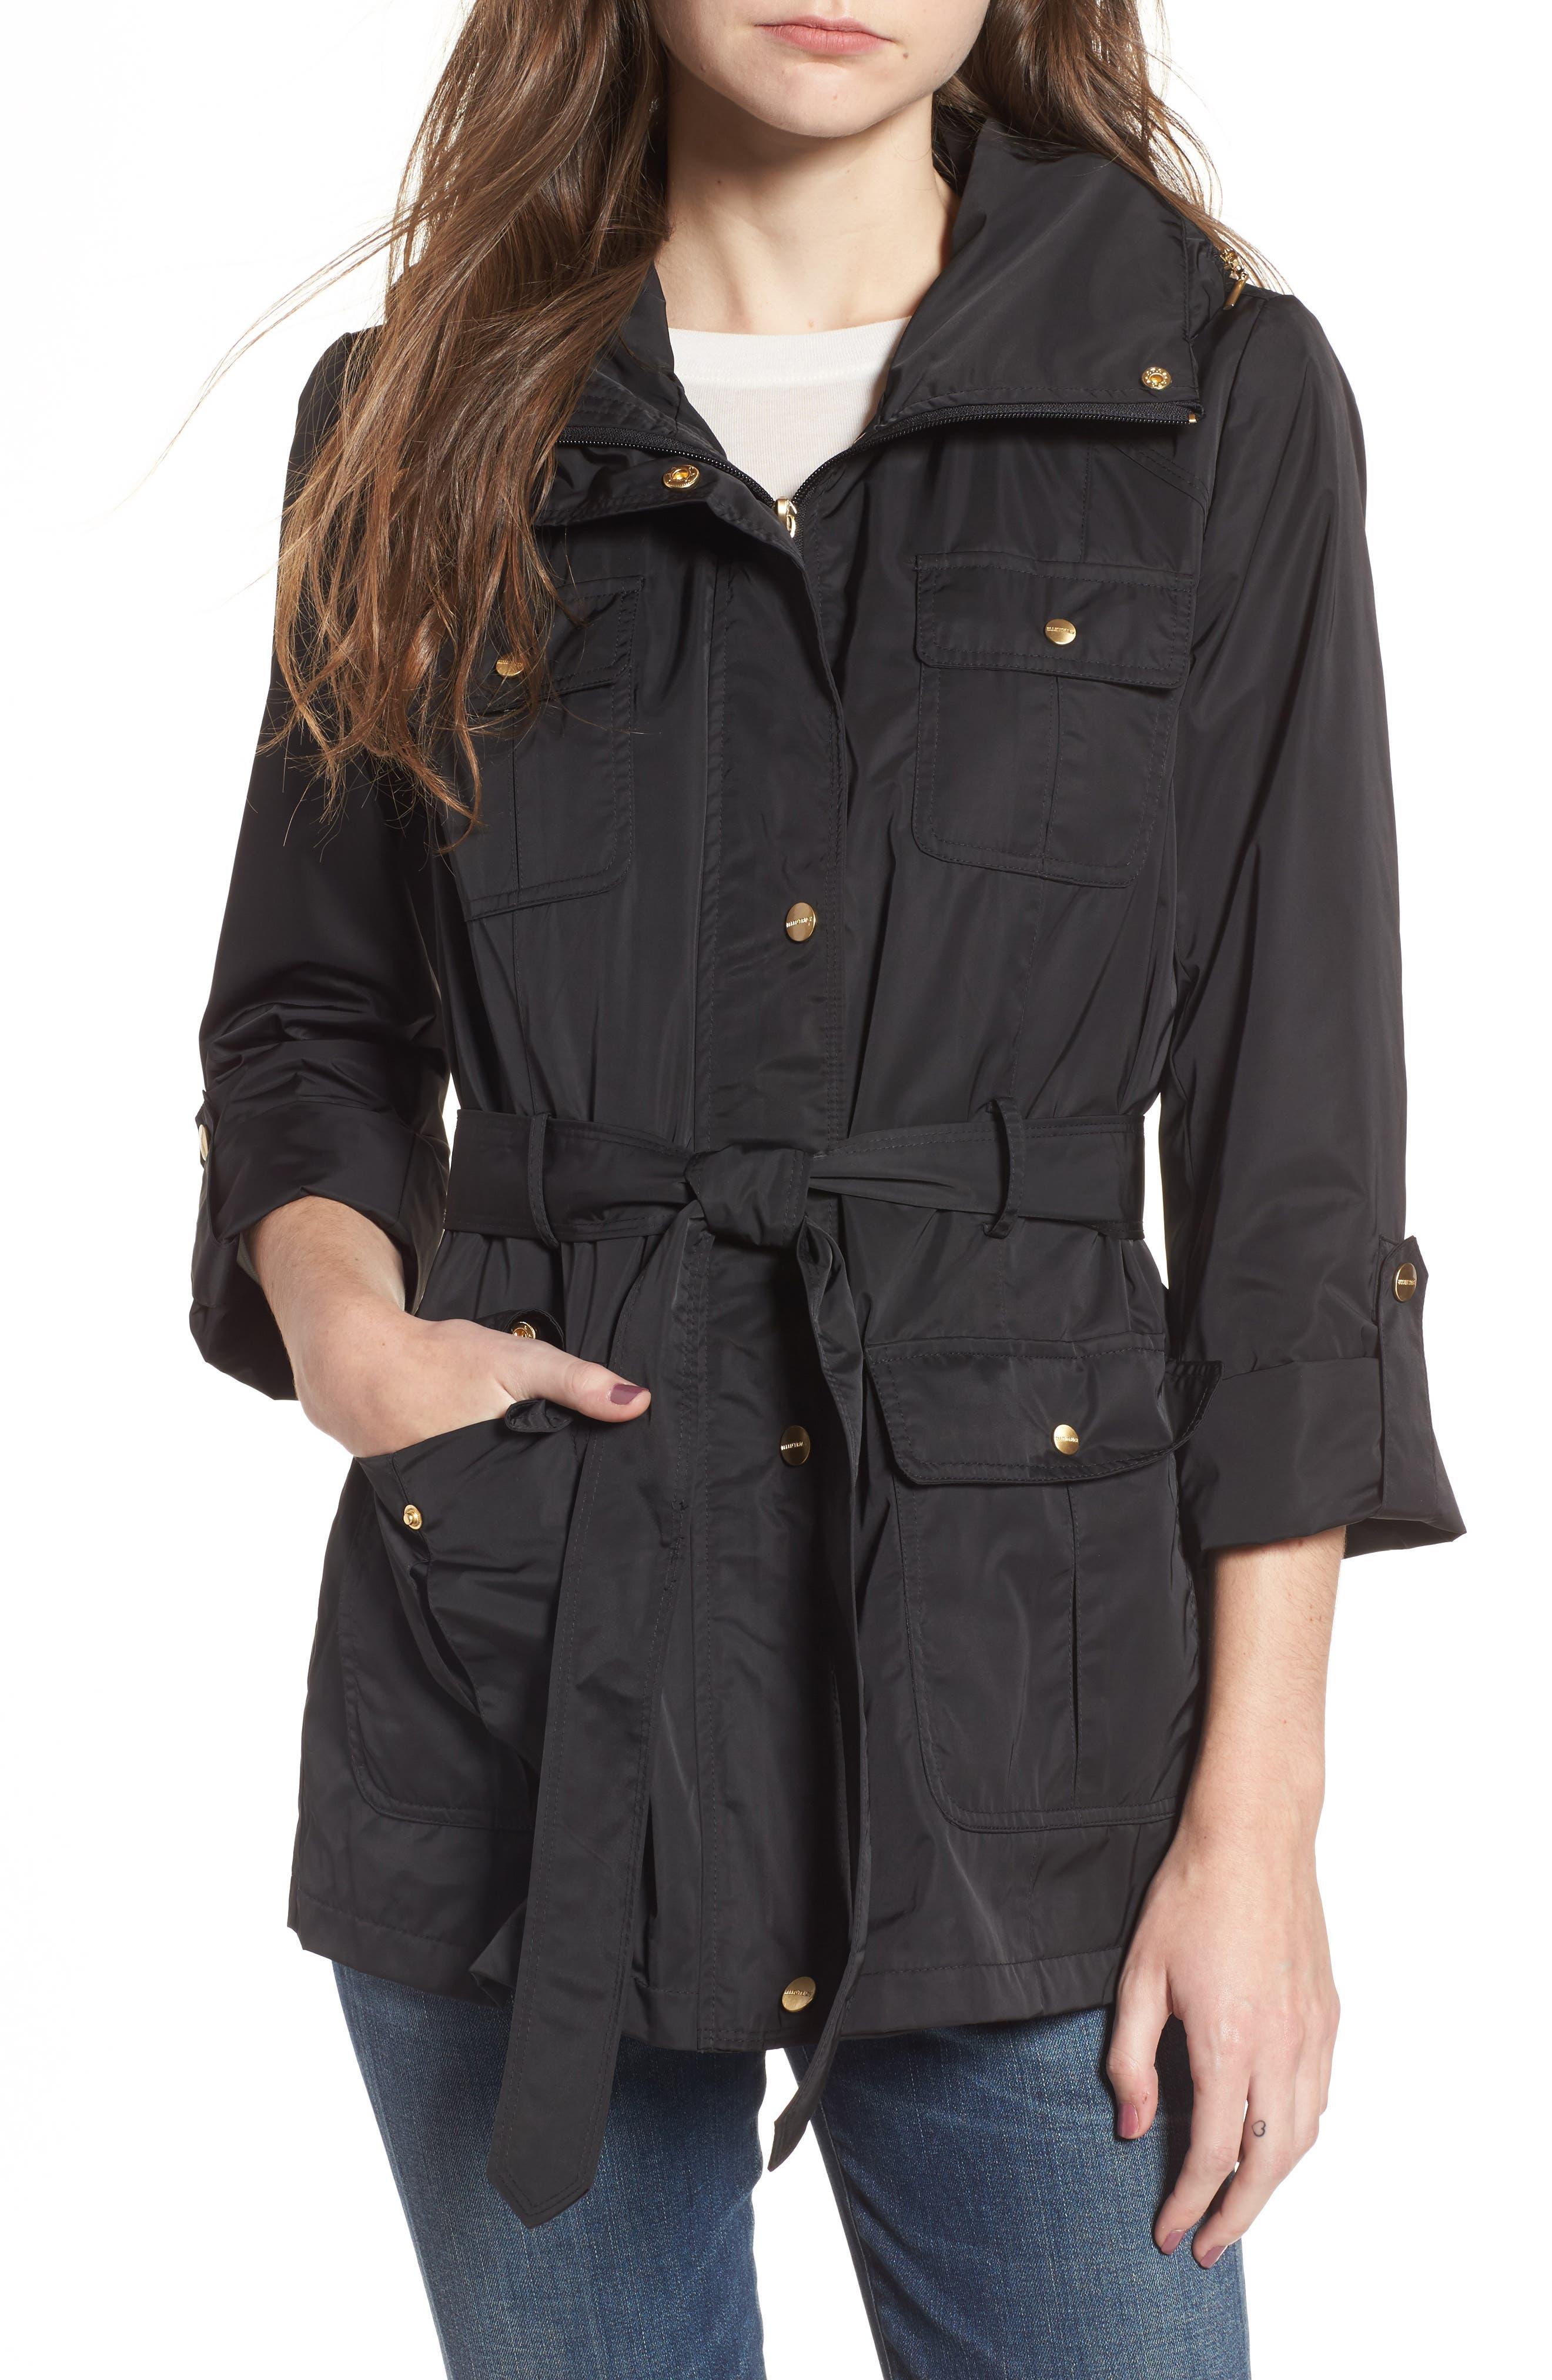 Alternate Image 1 Selected - Ellen Tracy Techno Short Trench Coat (Regular & Petite)